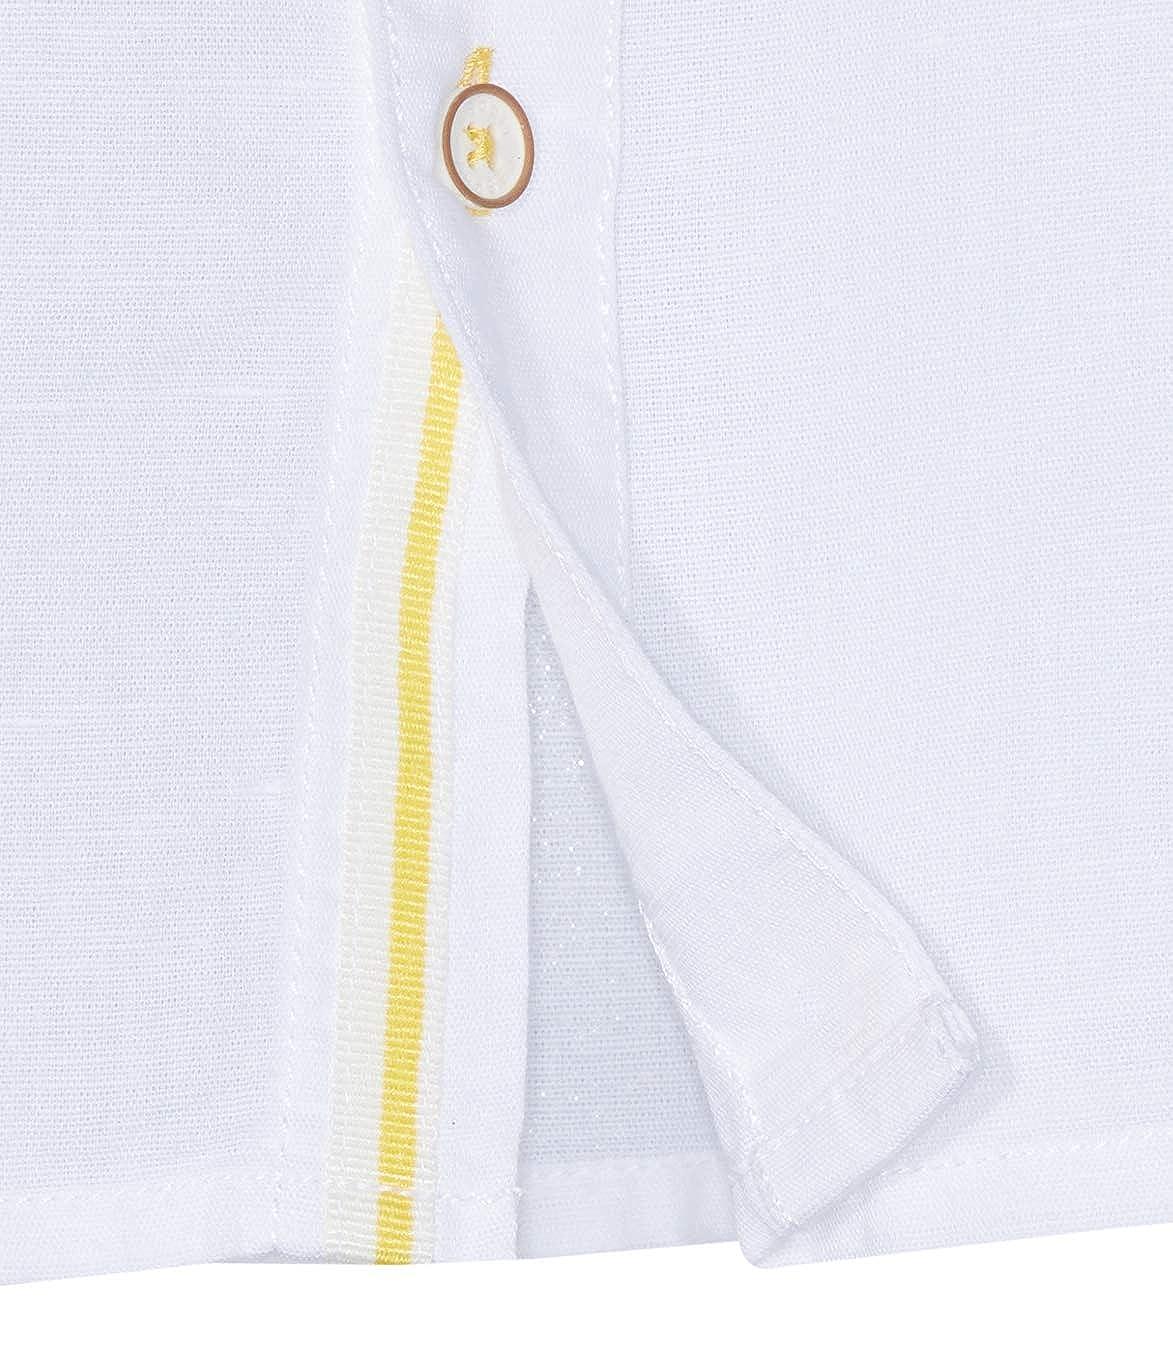 ESPRIT Boys Woven Shirt Blouse